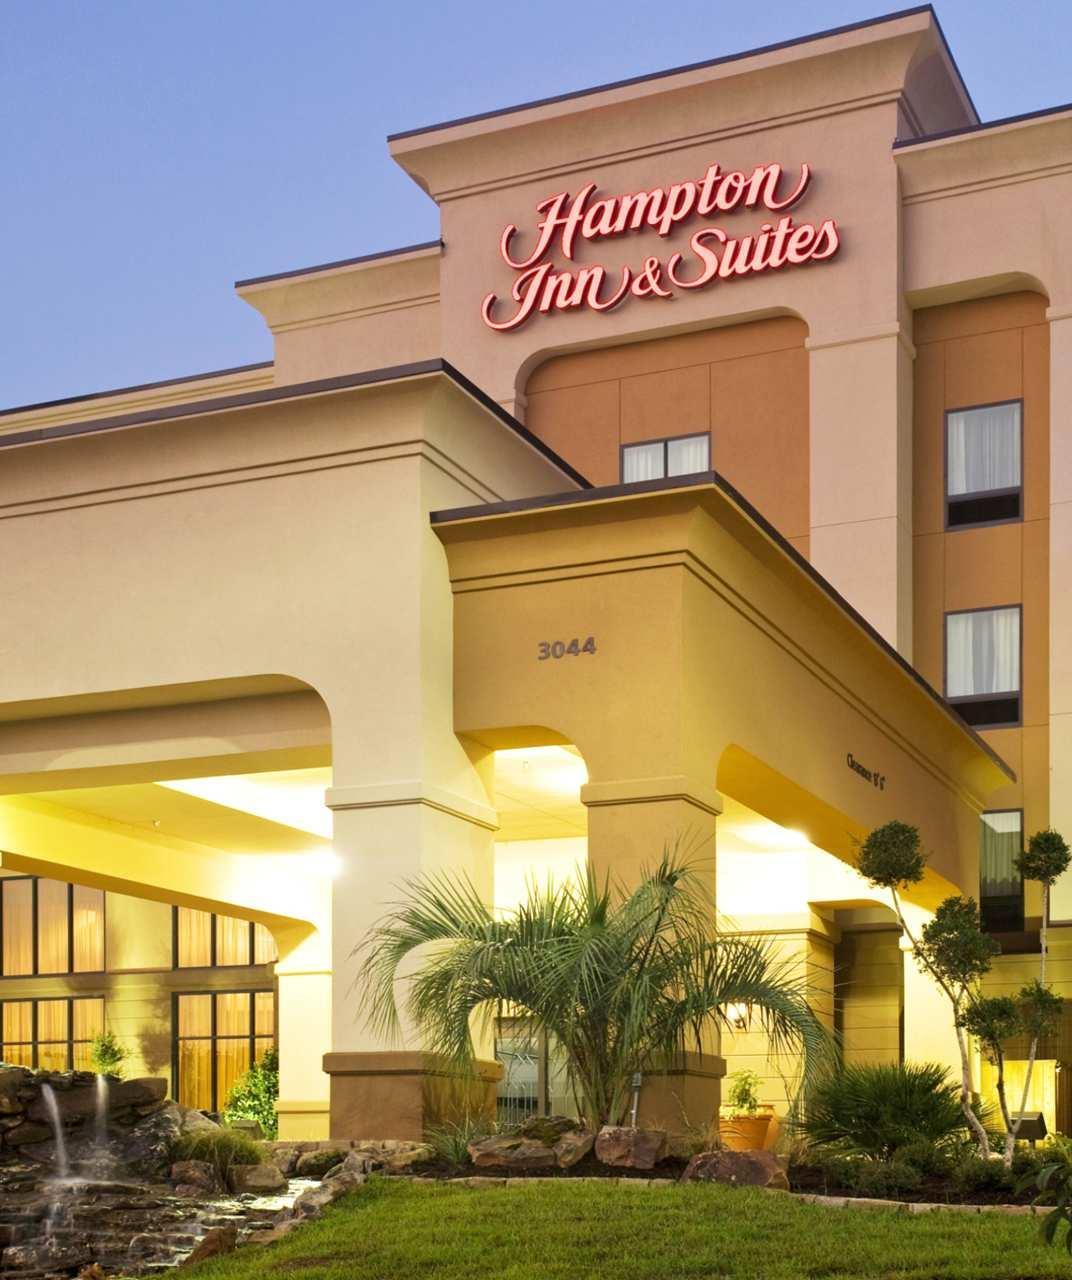 image of the Hampton Inn & Suites Longview North